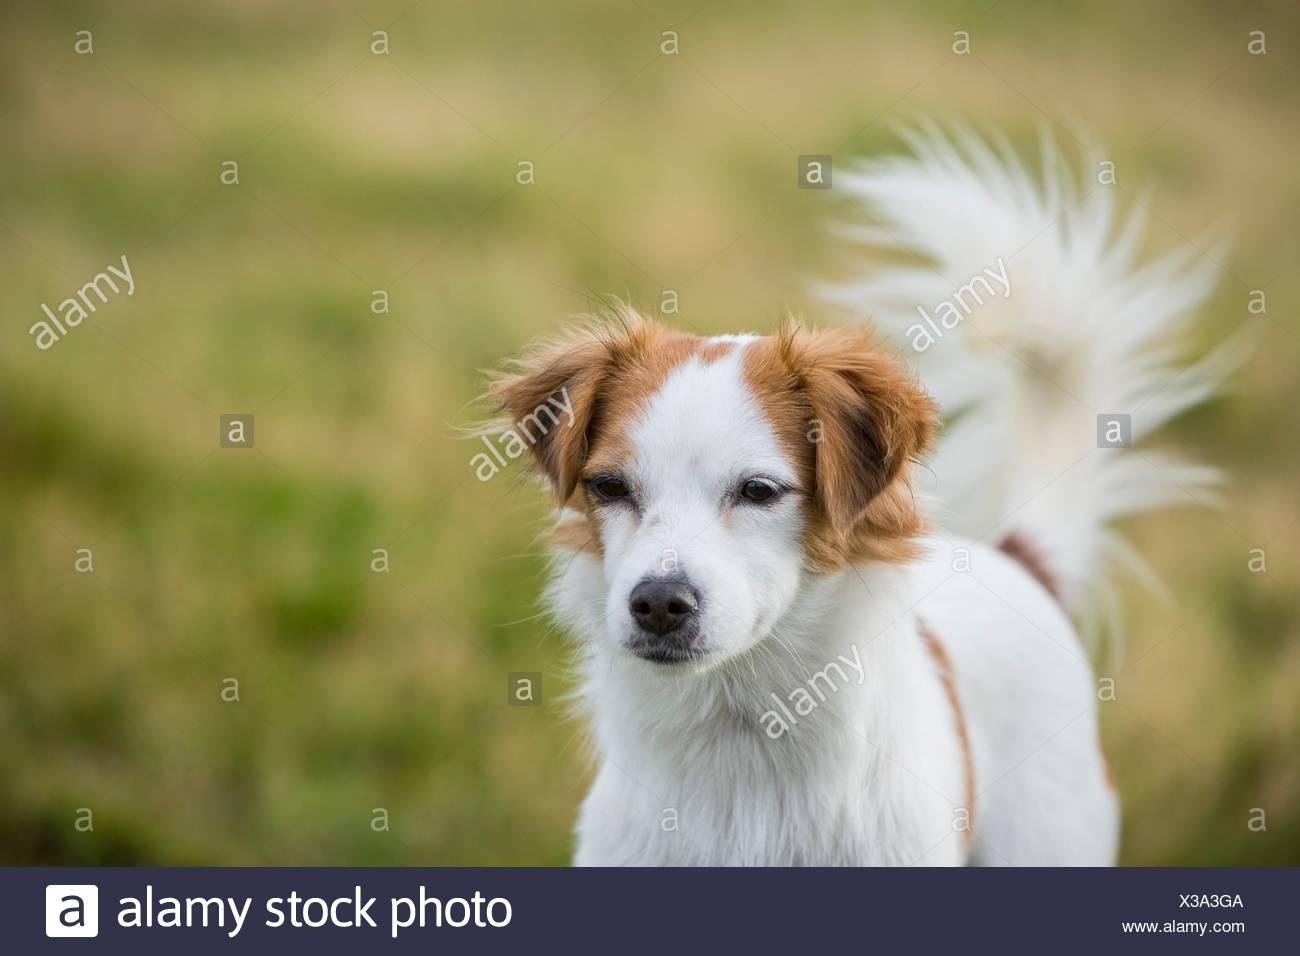 Retrato de mujer mongrel dog Imagen De Stock